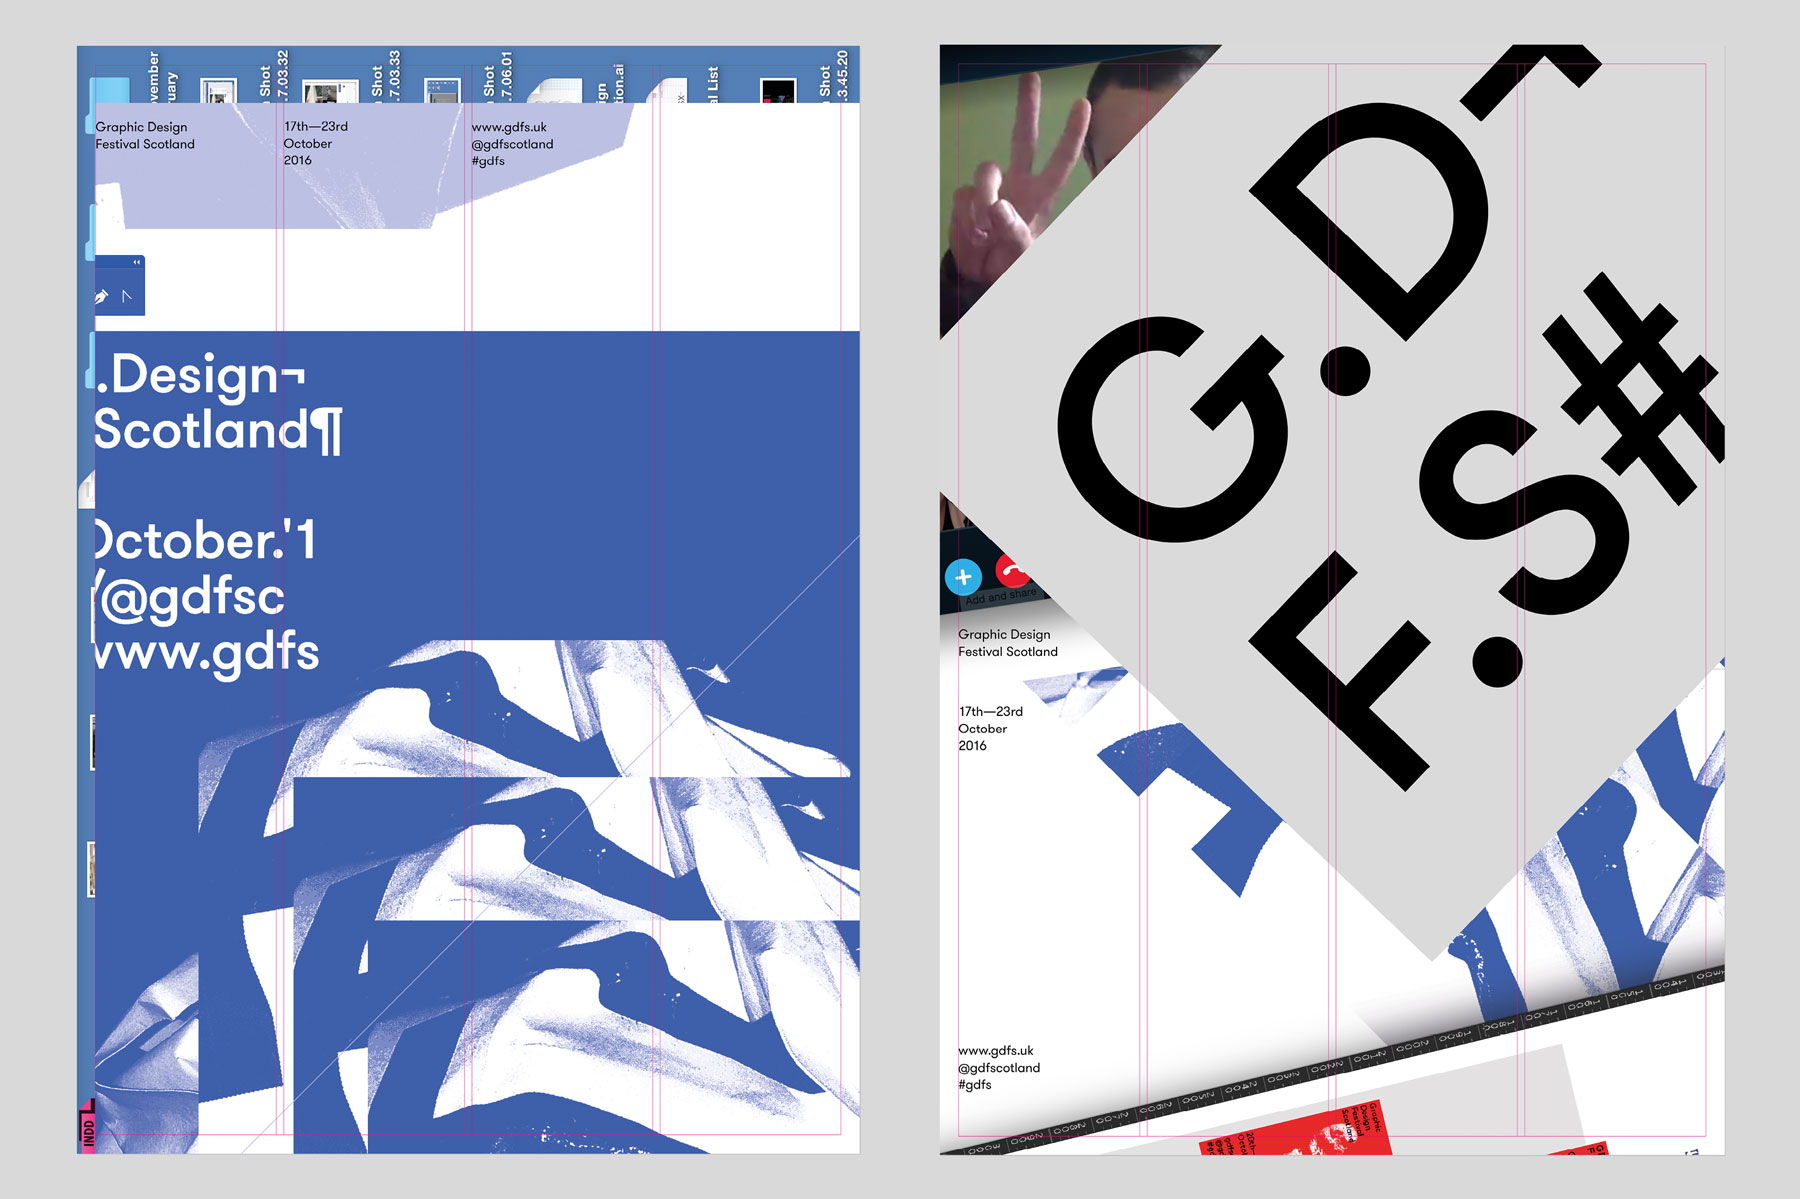 3gdfs-16-custom-identity-posters